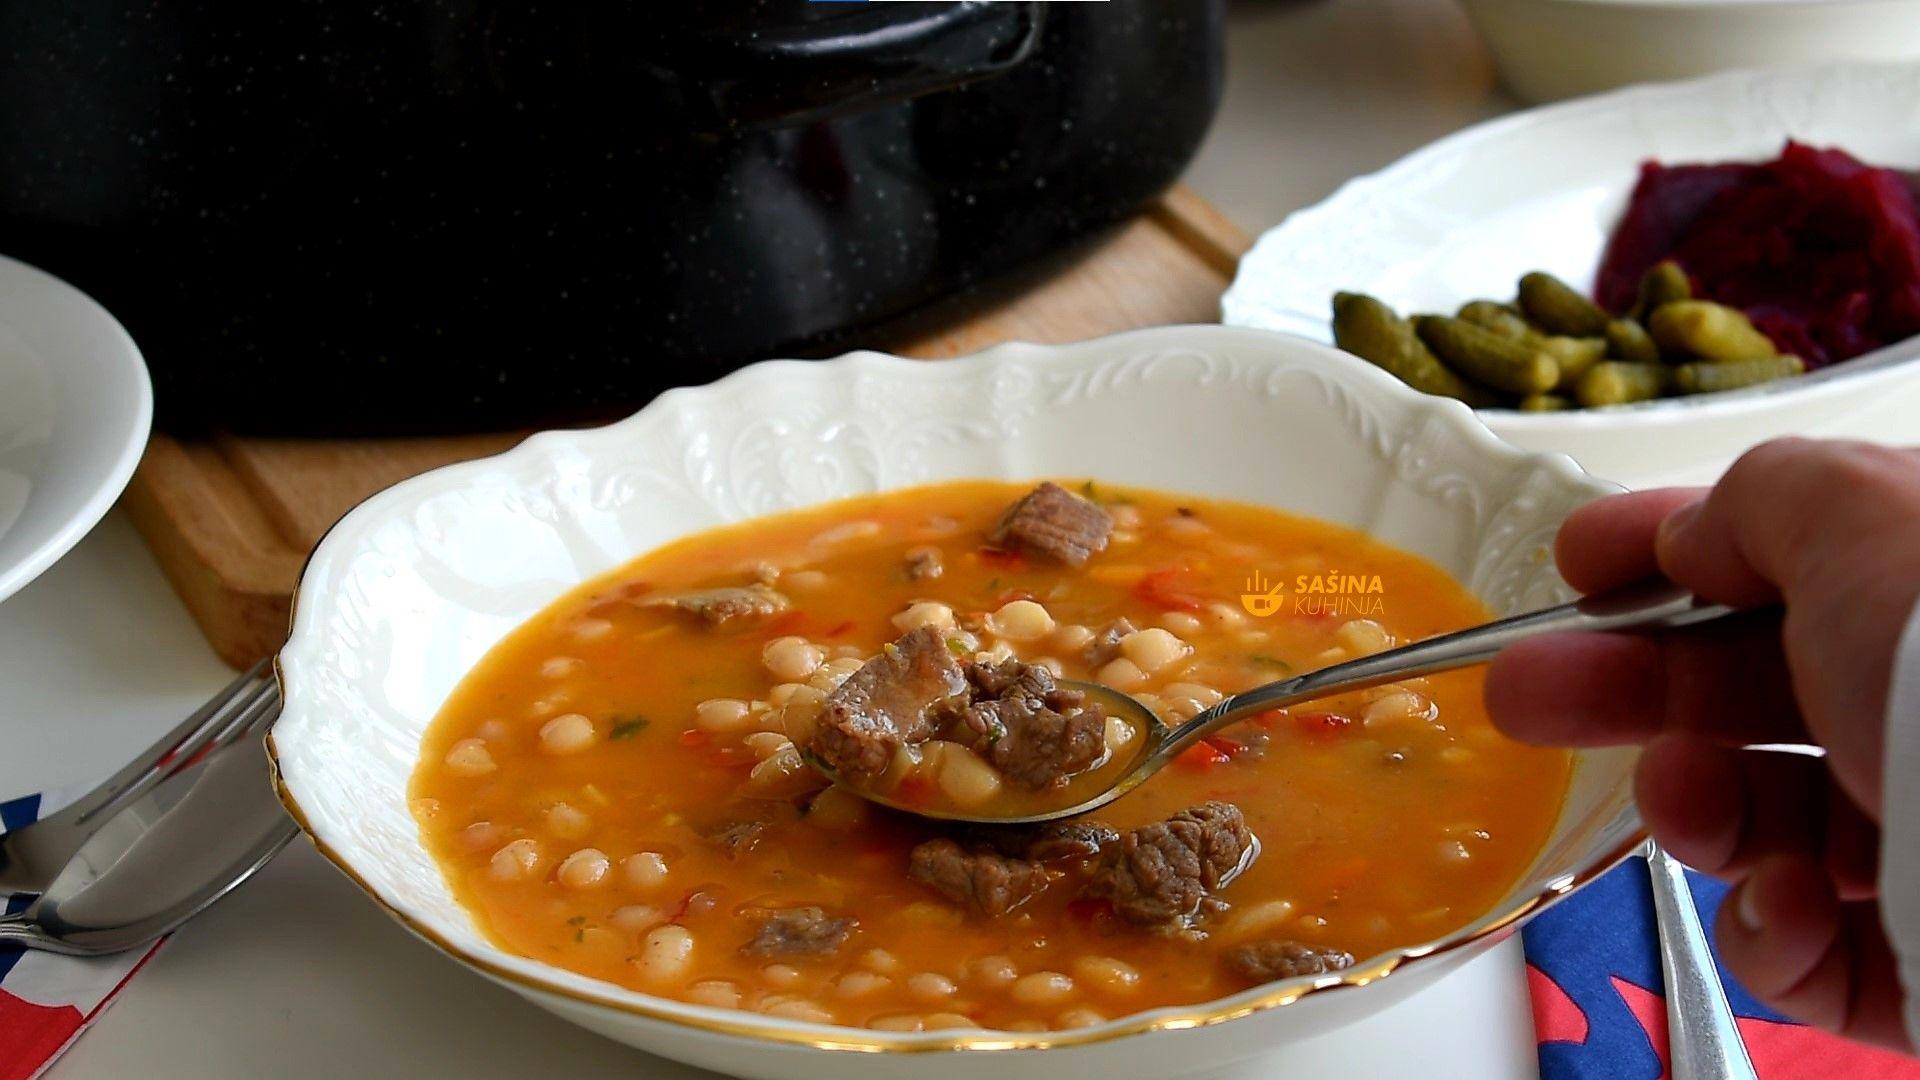 grah s junetinom recept